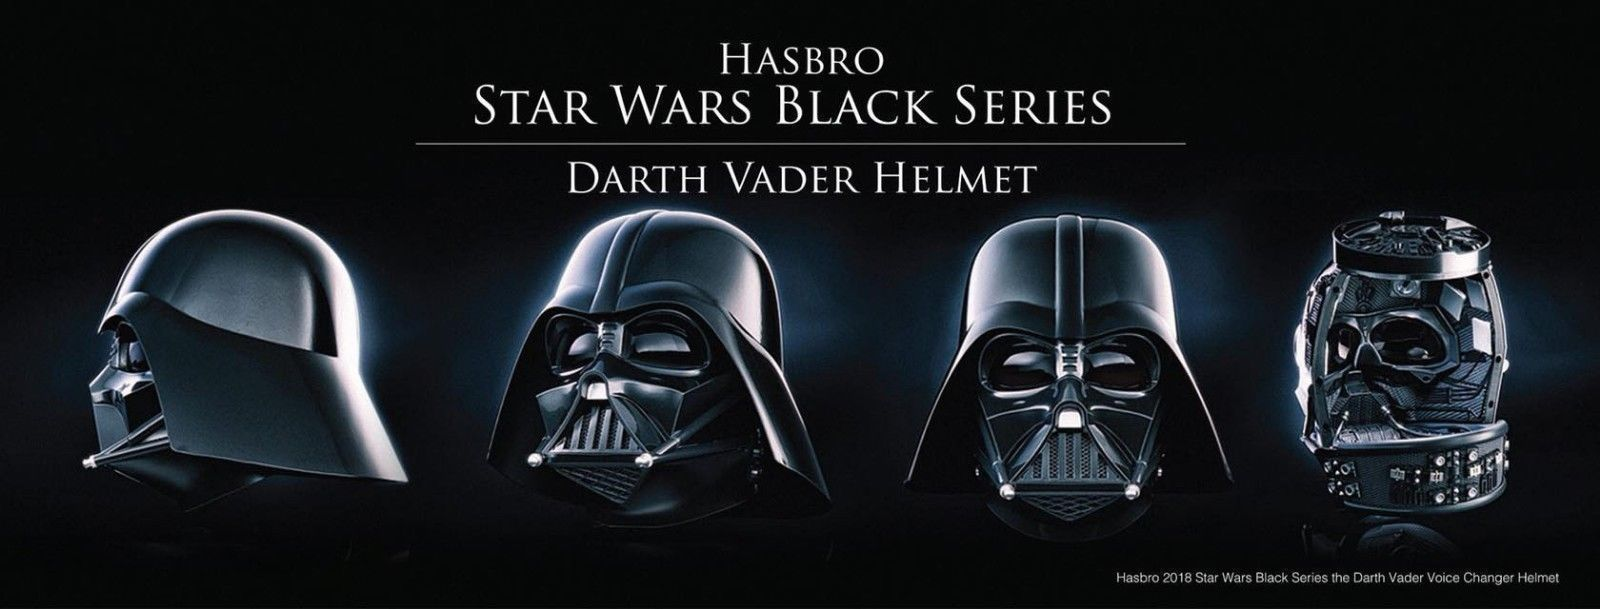 Hasbro Star Wars Black Series Darth Vader Electronic Voice Changer Helmet